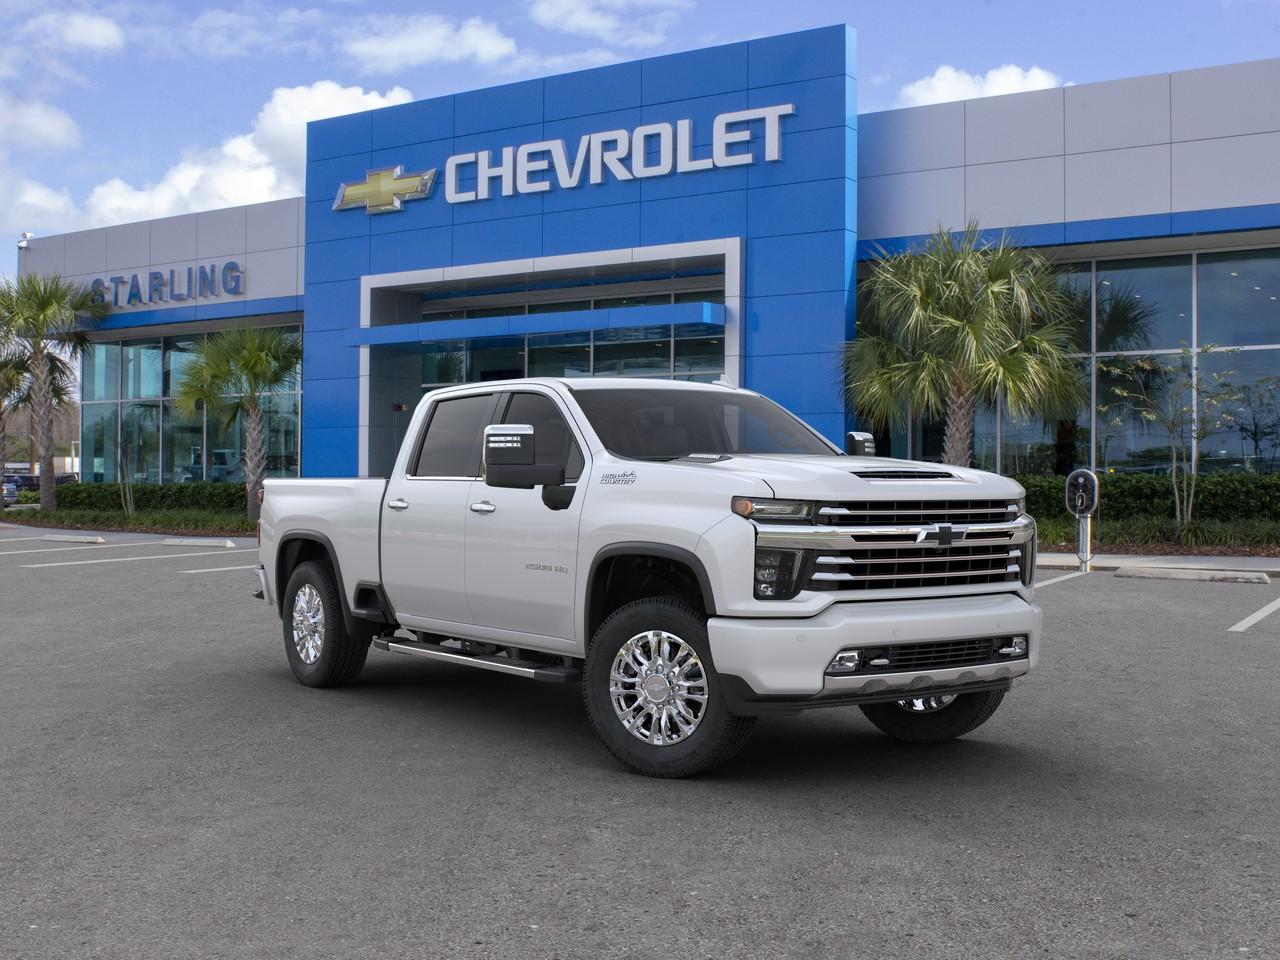 New 2020 Chevrolet Silverado 2500 HD High Country